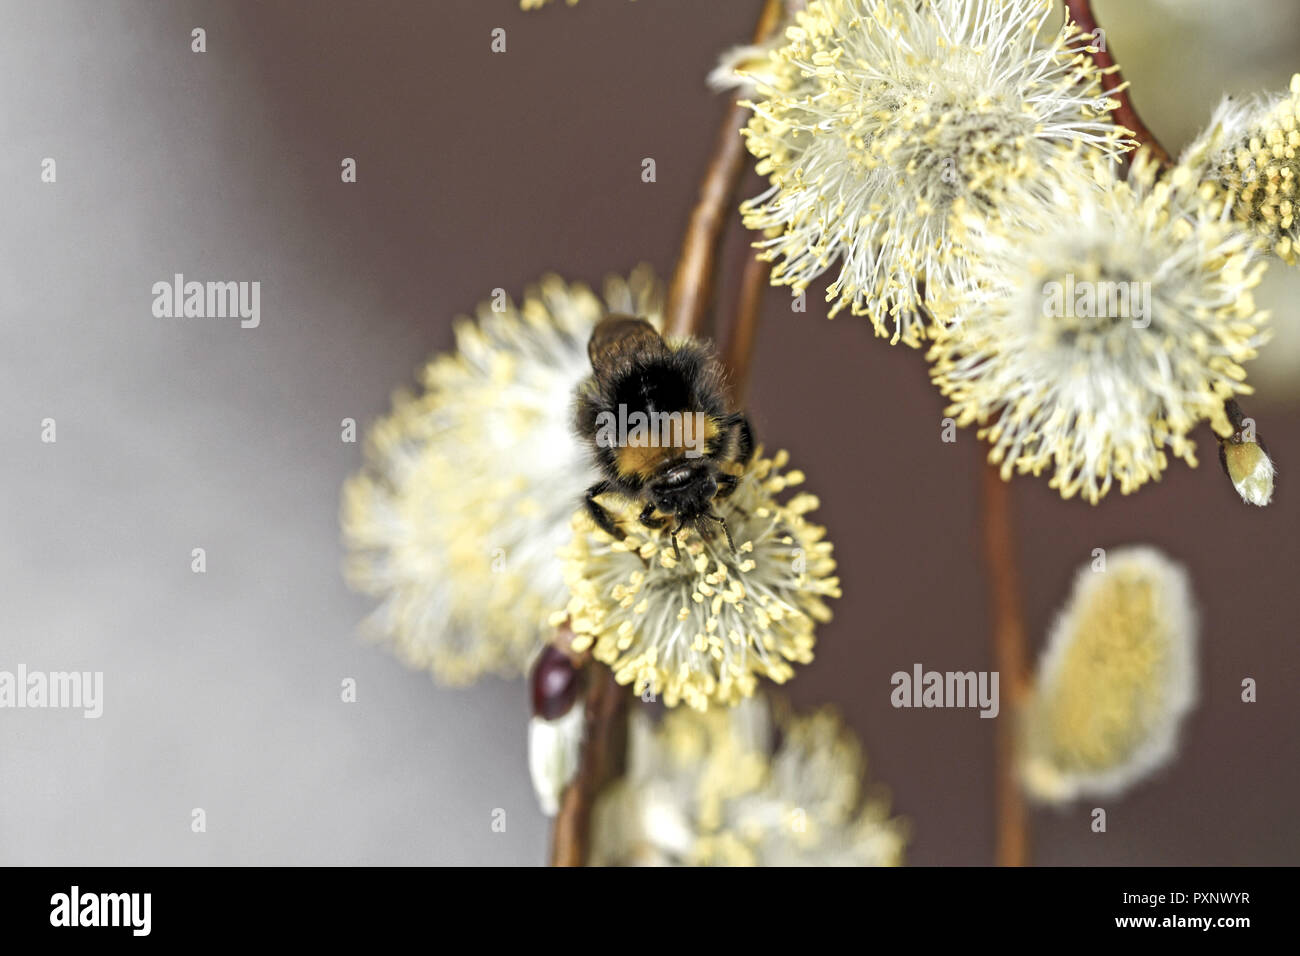 Nahaufnahme von bluehenden Weidenkaetzchen, Salweide, Salix caprea Stock Photo